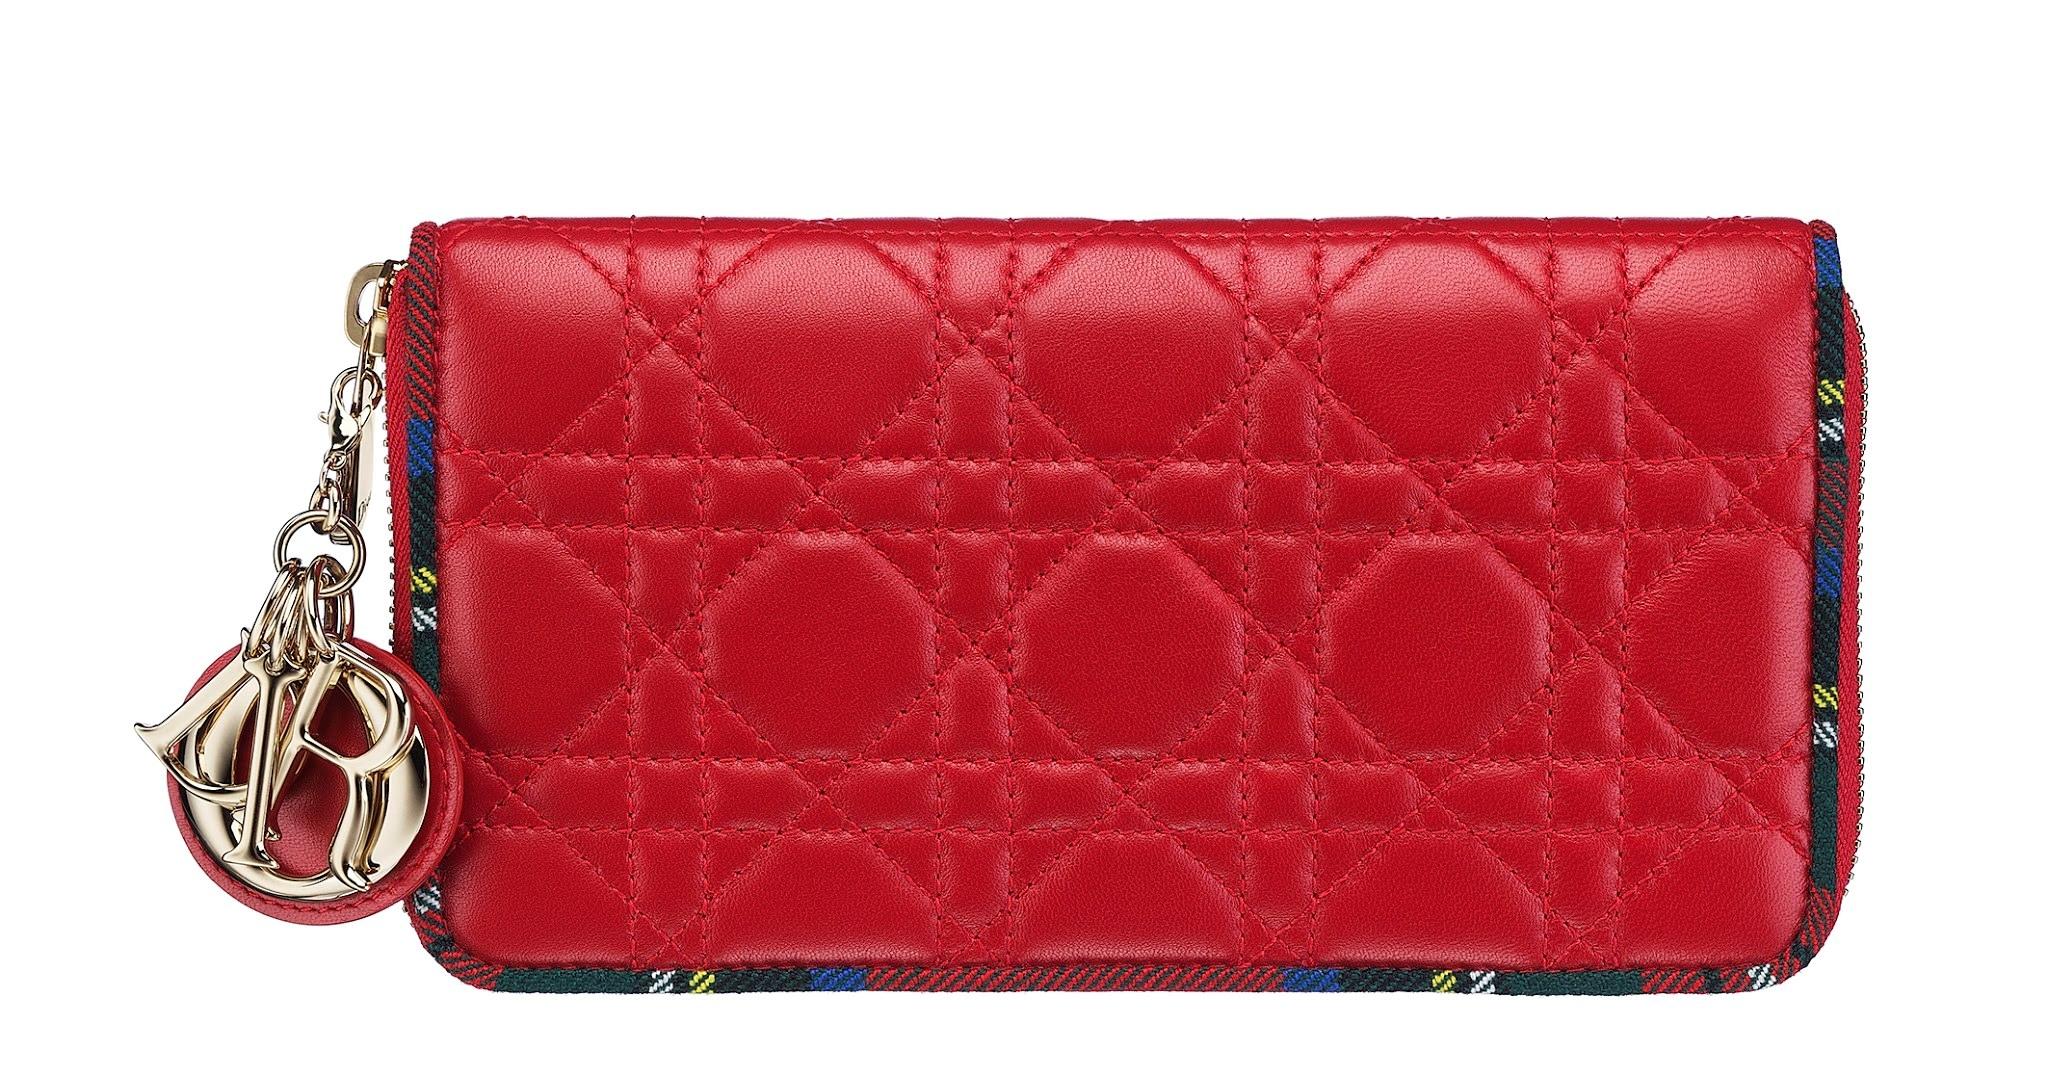 Christian-Dior-Red-voyageur-lambskin